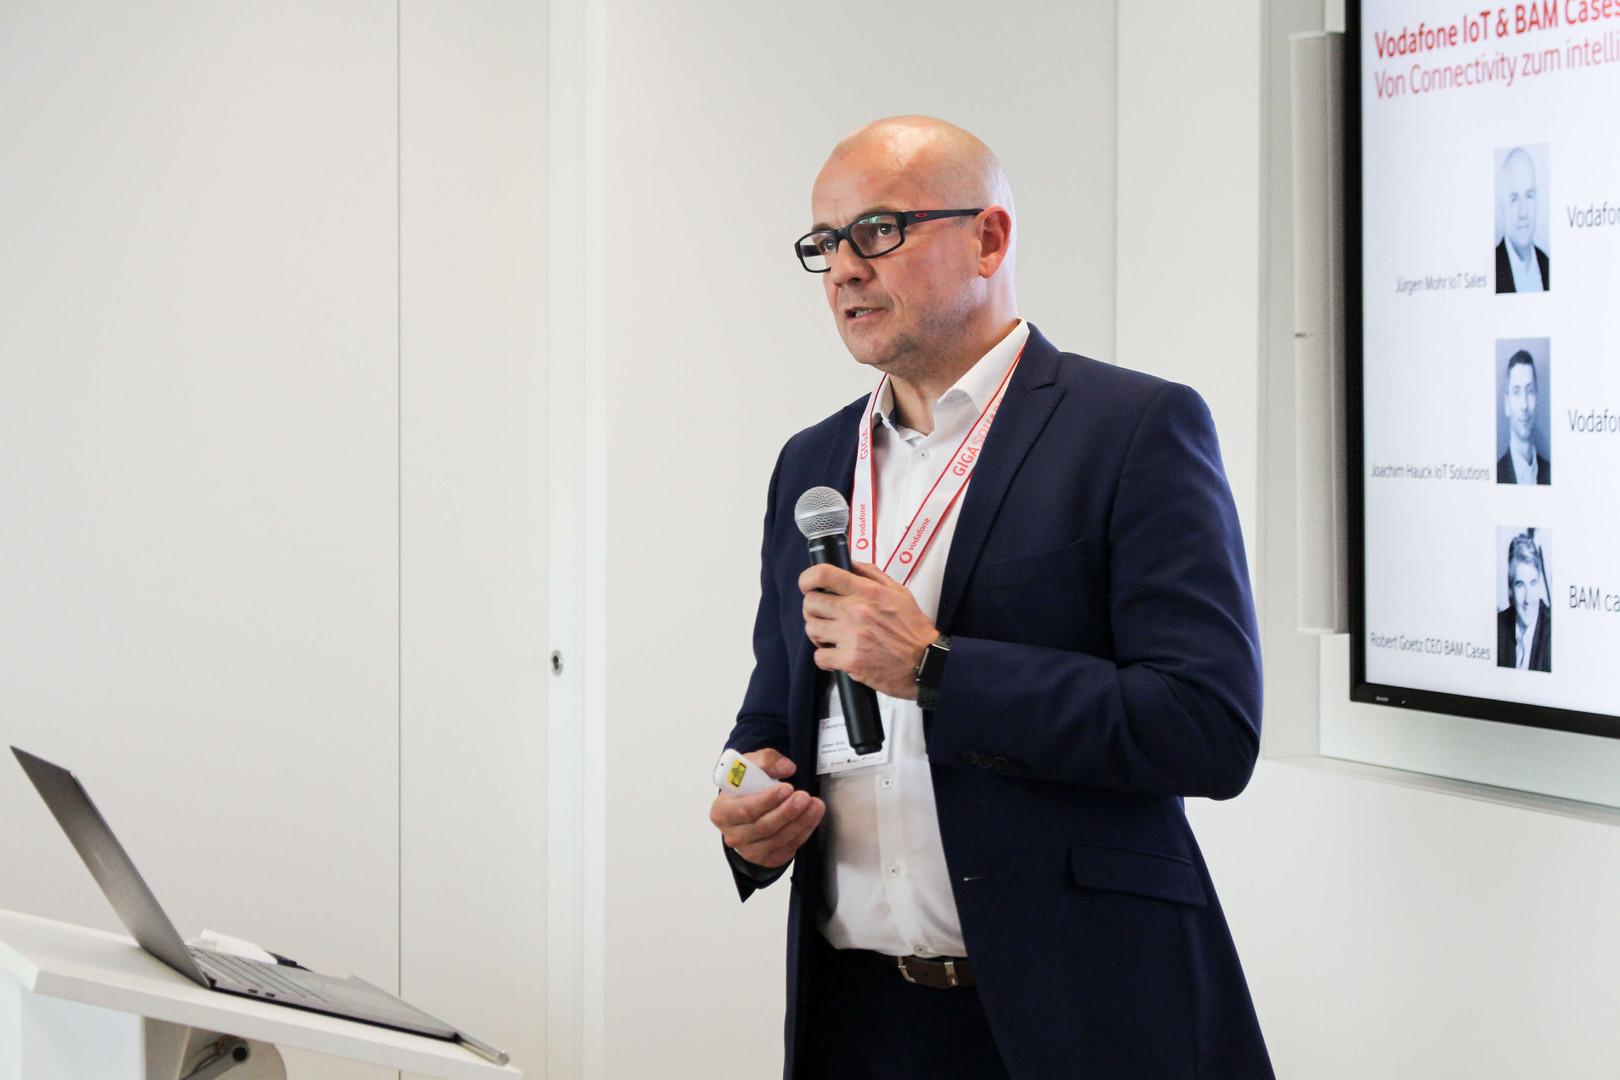 JÜRGEN MOHR   IoT Sales Manager, Vodafone Group